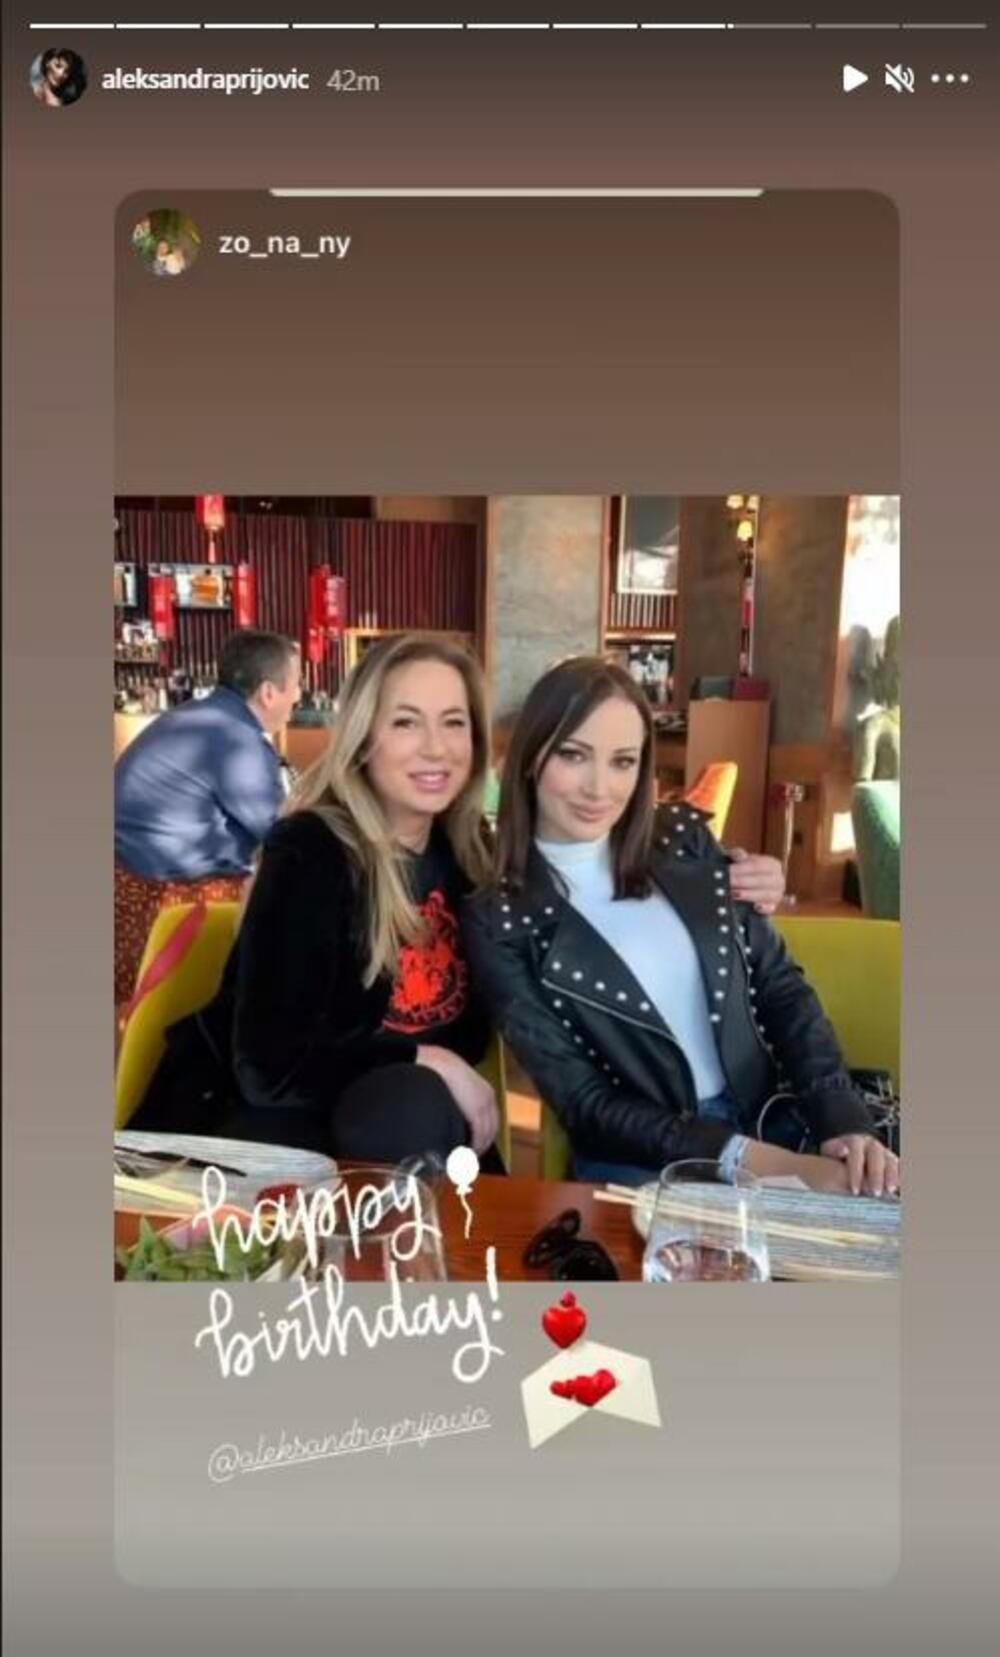 <p><strong>Aleksandra Prijović</strong> slavi rođendan danas, a čestitke se samo nižu— među njima se našla i čestitka njene svekrve<strong>Zorice Nakić</strong></p>